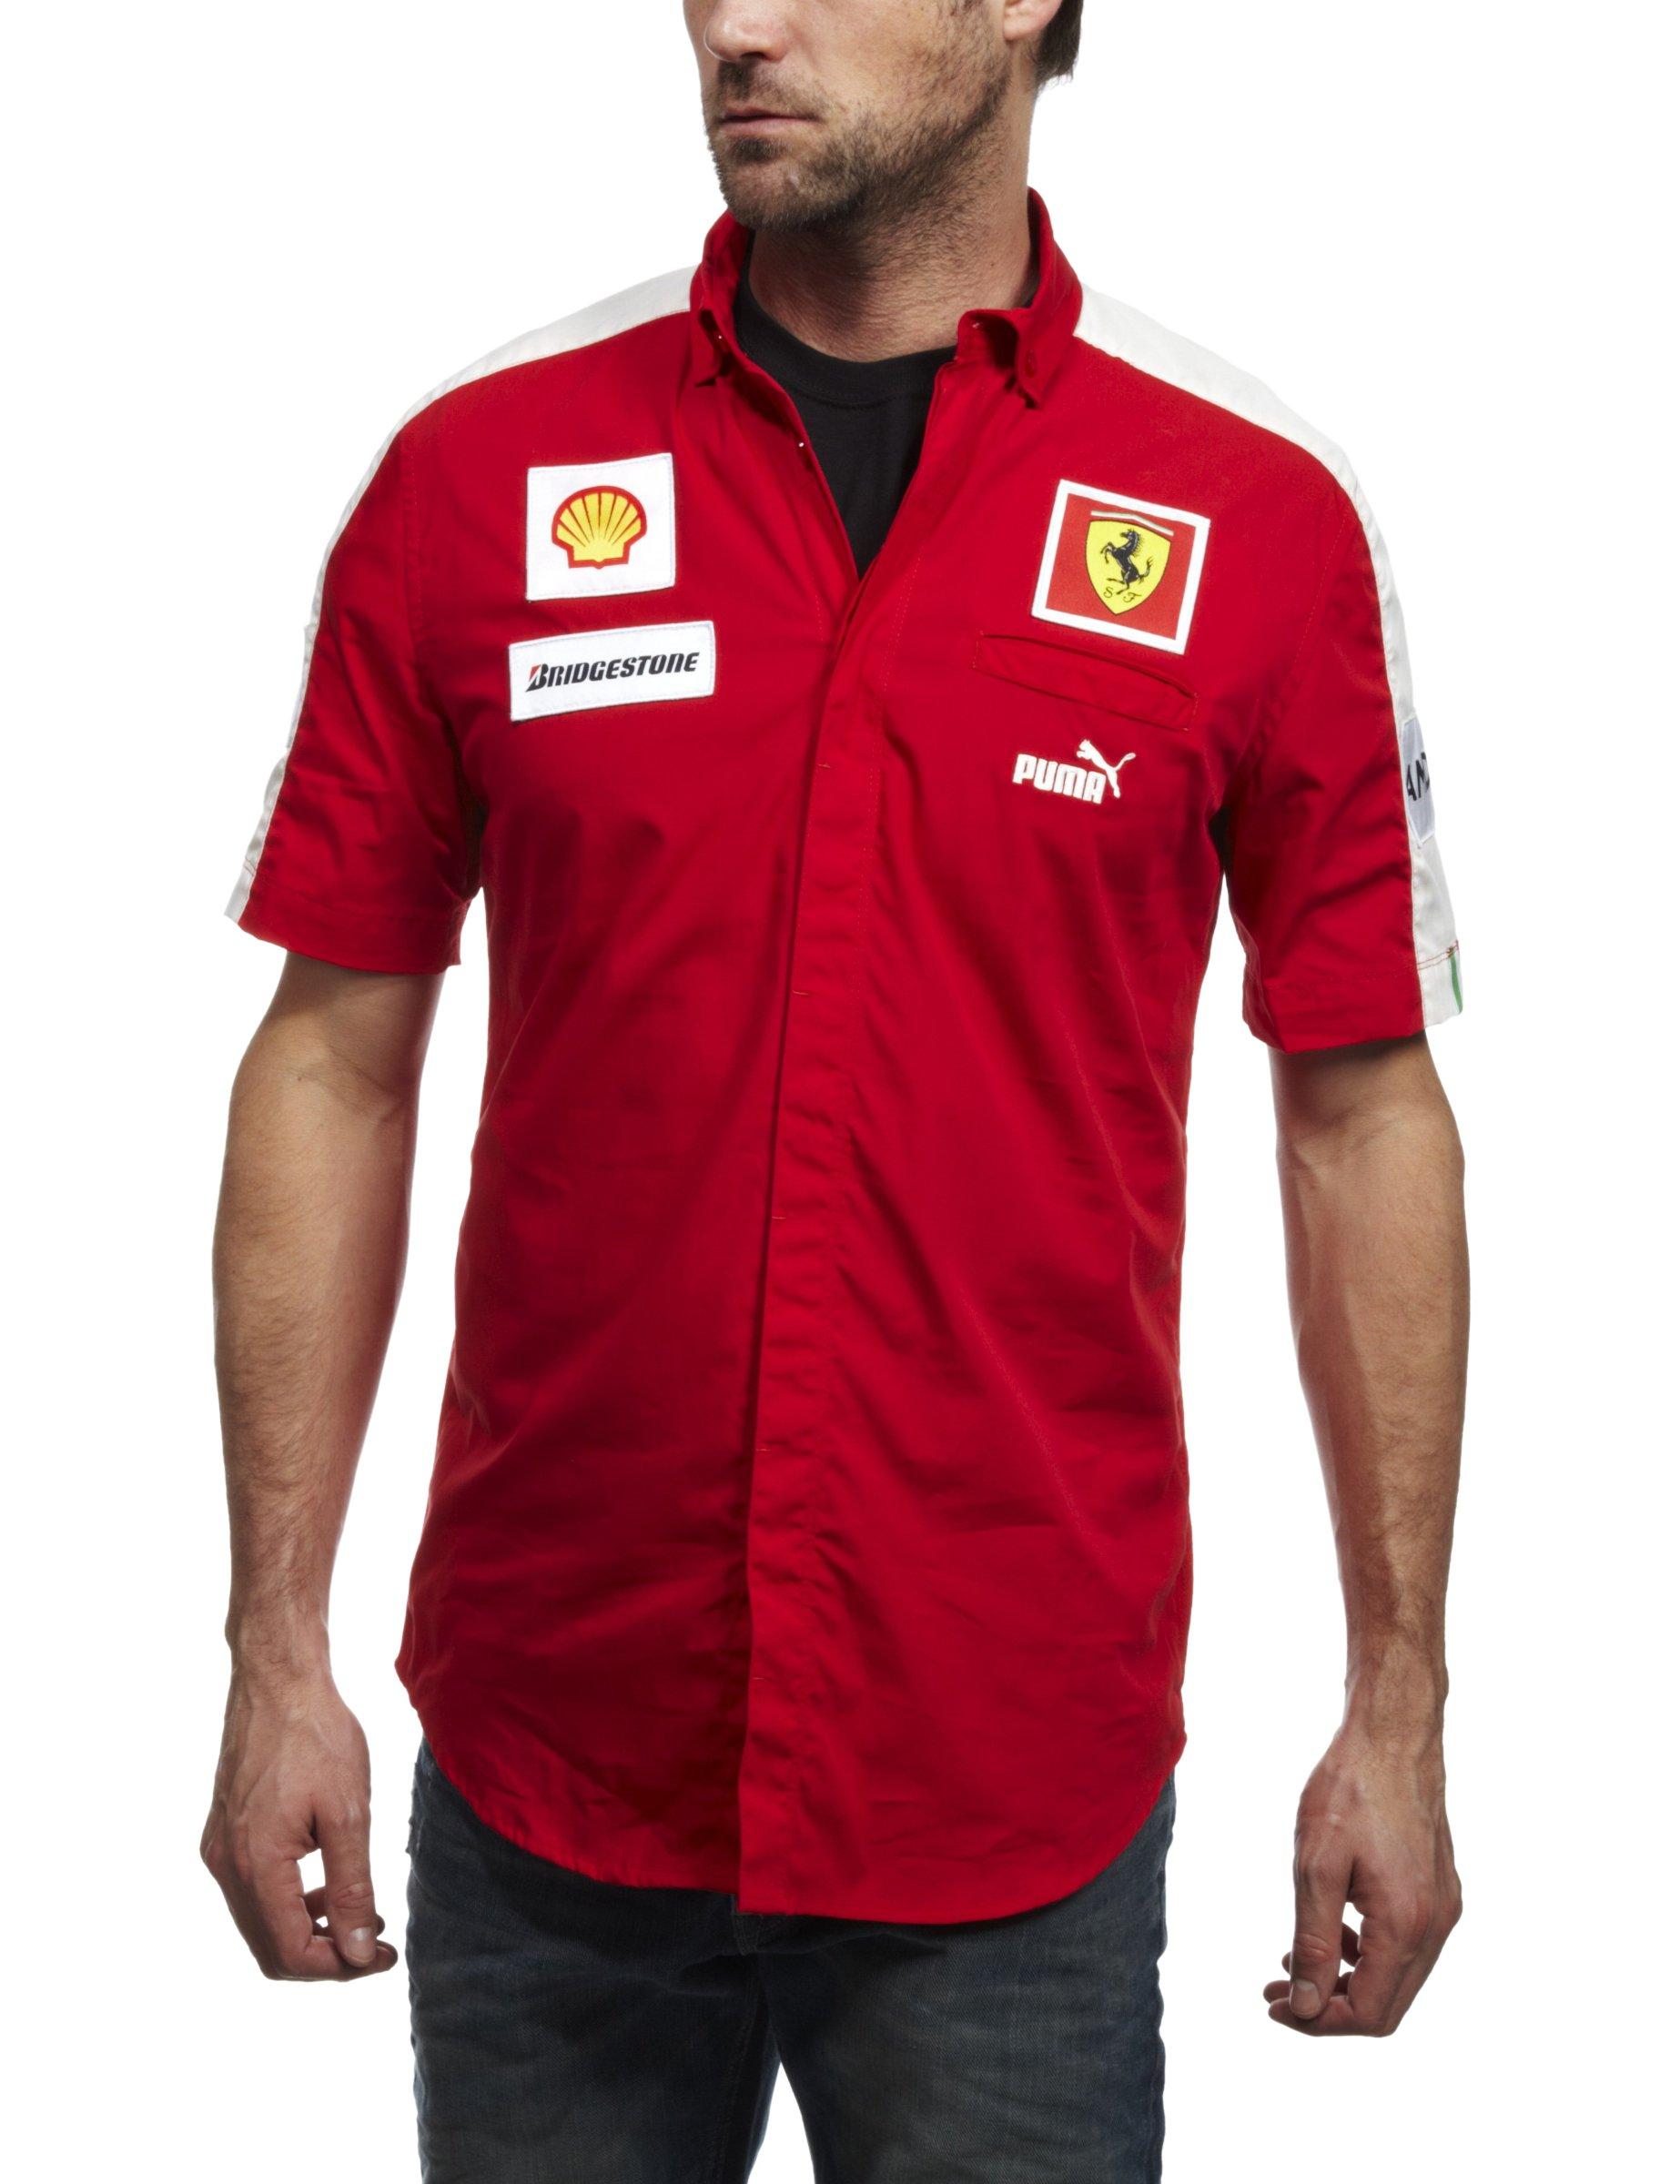 PUMA SF Team Shirt Rojo Hombre Camisa Ferrari: Amazon.es: Deportes y aire libre